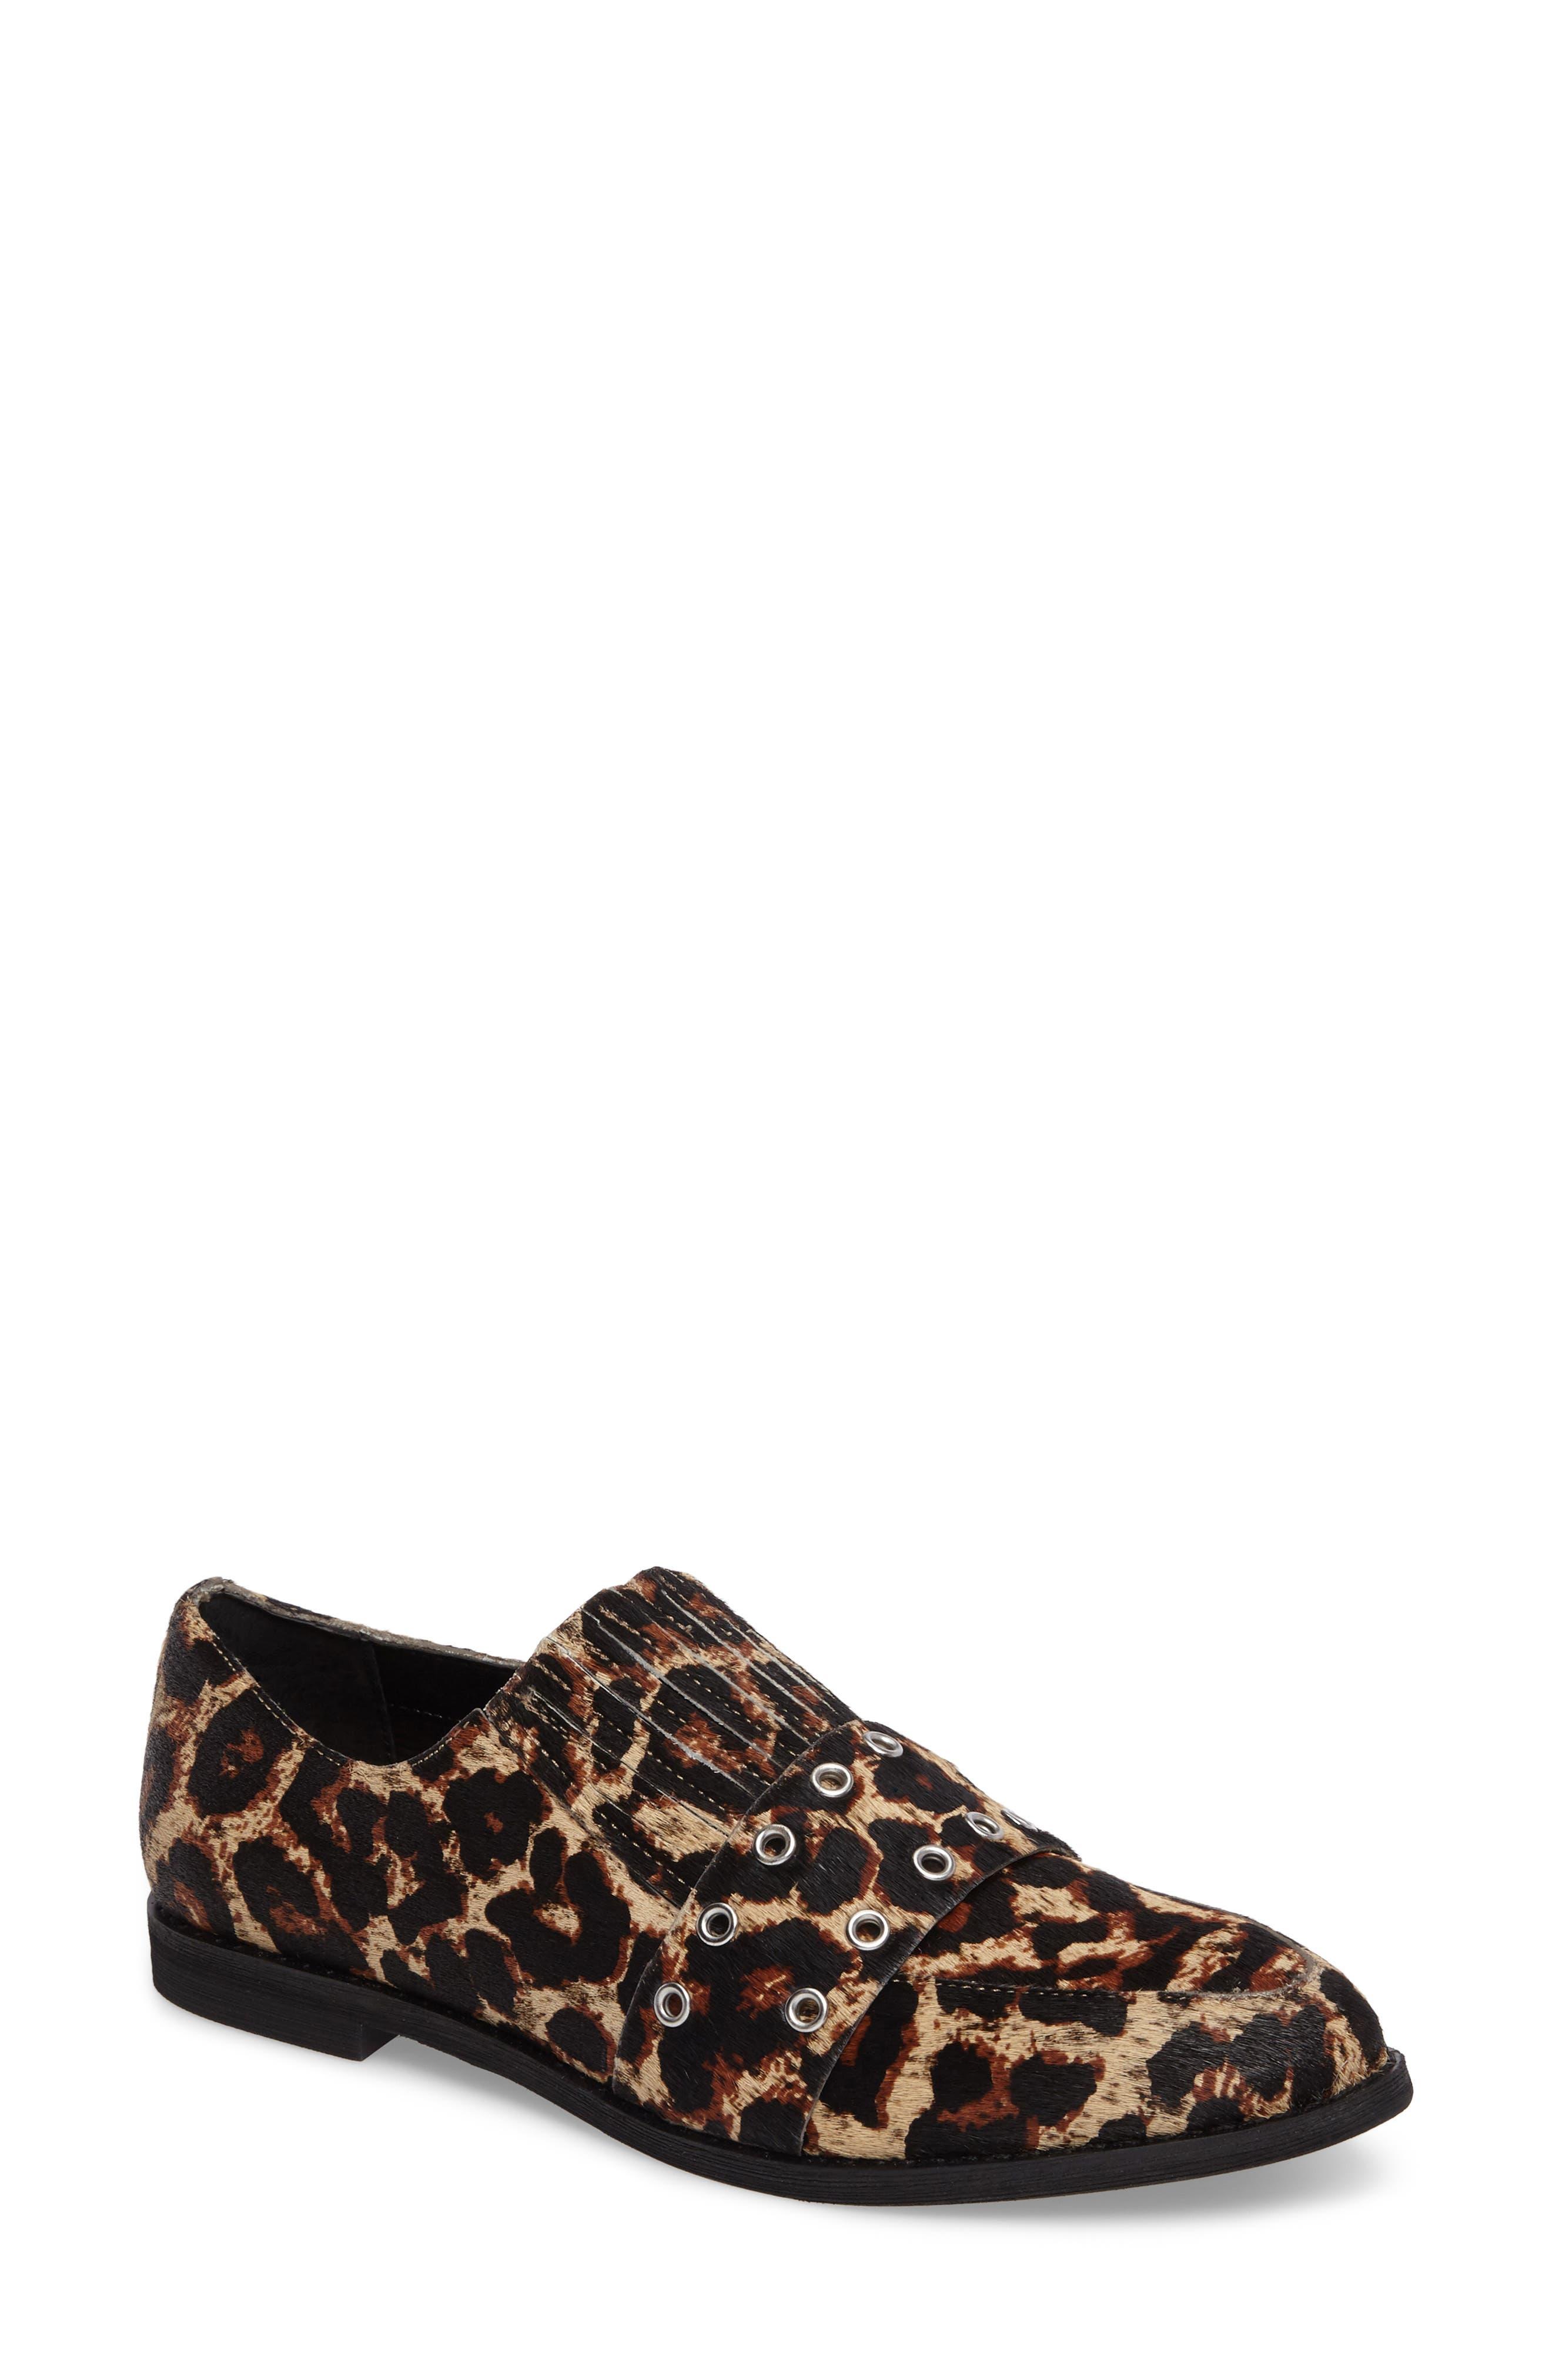 TREASURE & BOND Ainsley Pointy Toe Loafer